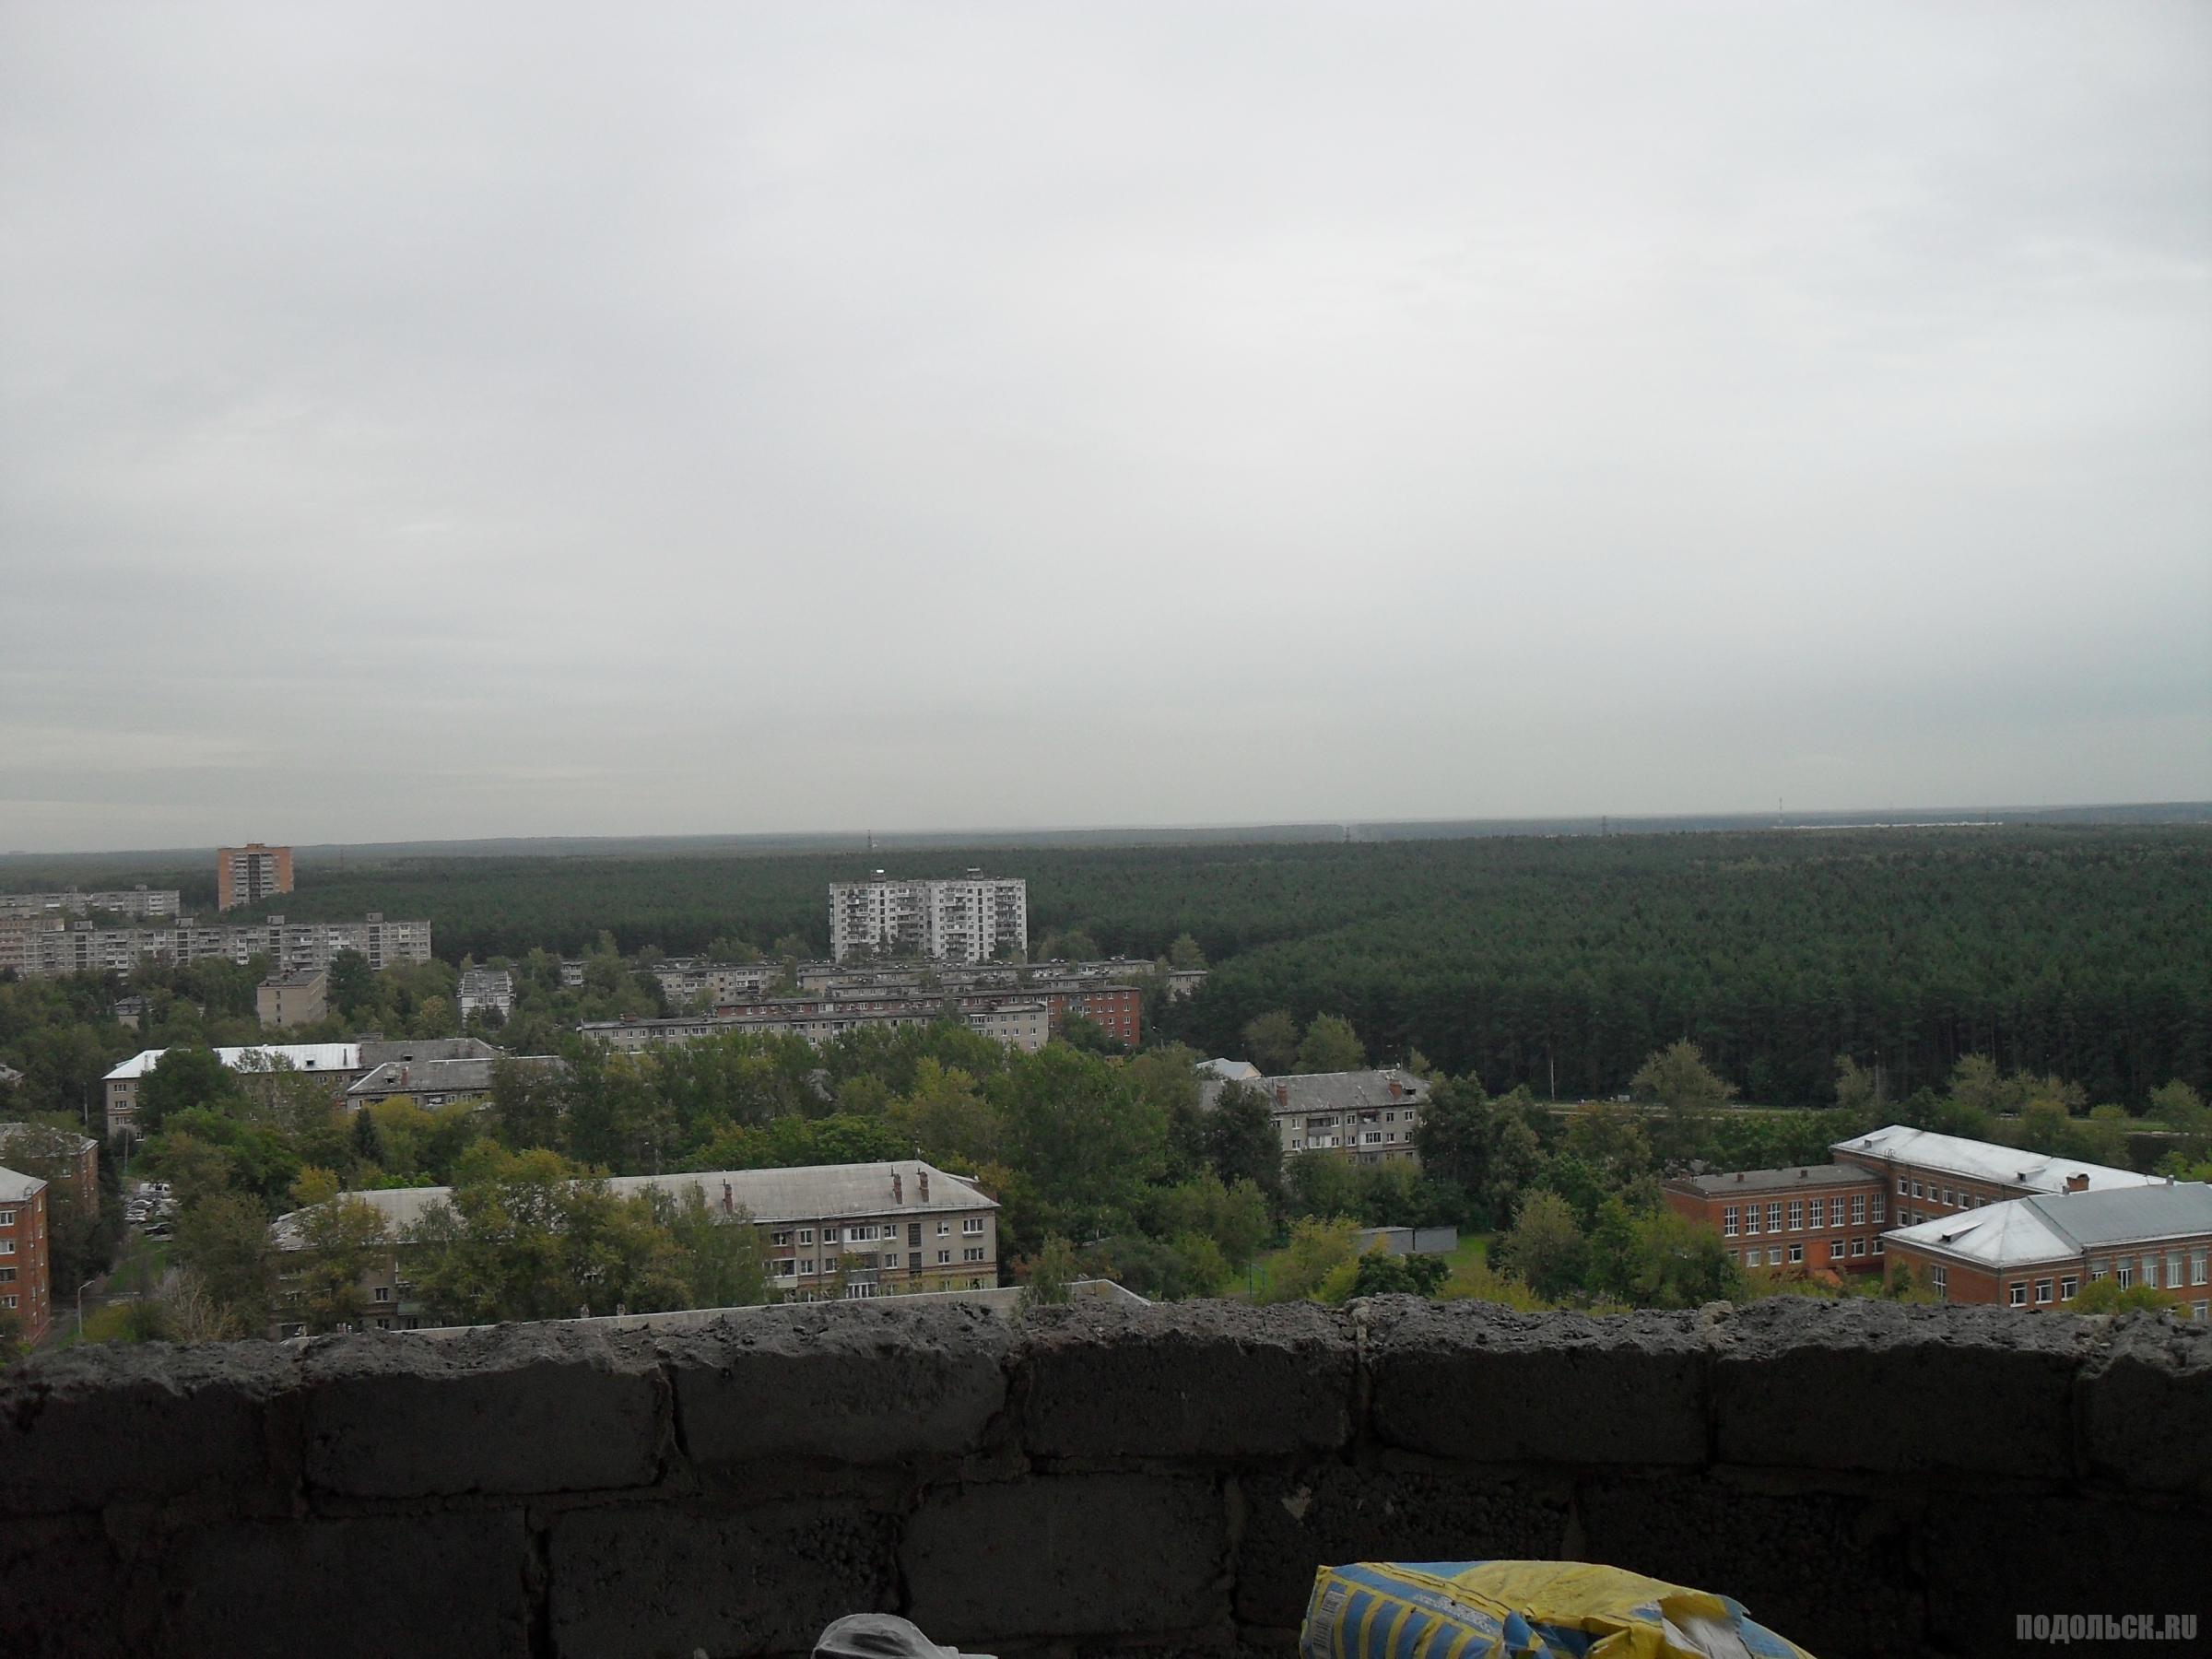 Вид с 18-го этажа дома на Электромонтажном, 11. Сентябрь 2015 г.